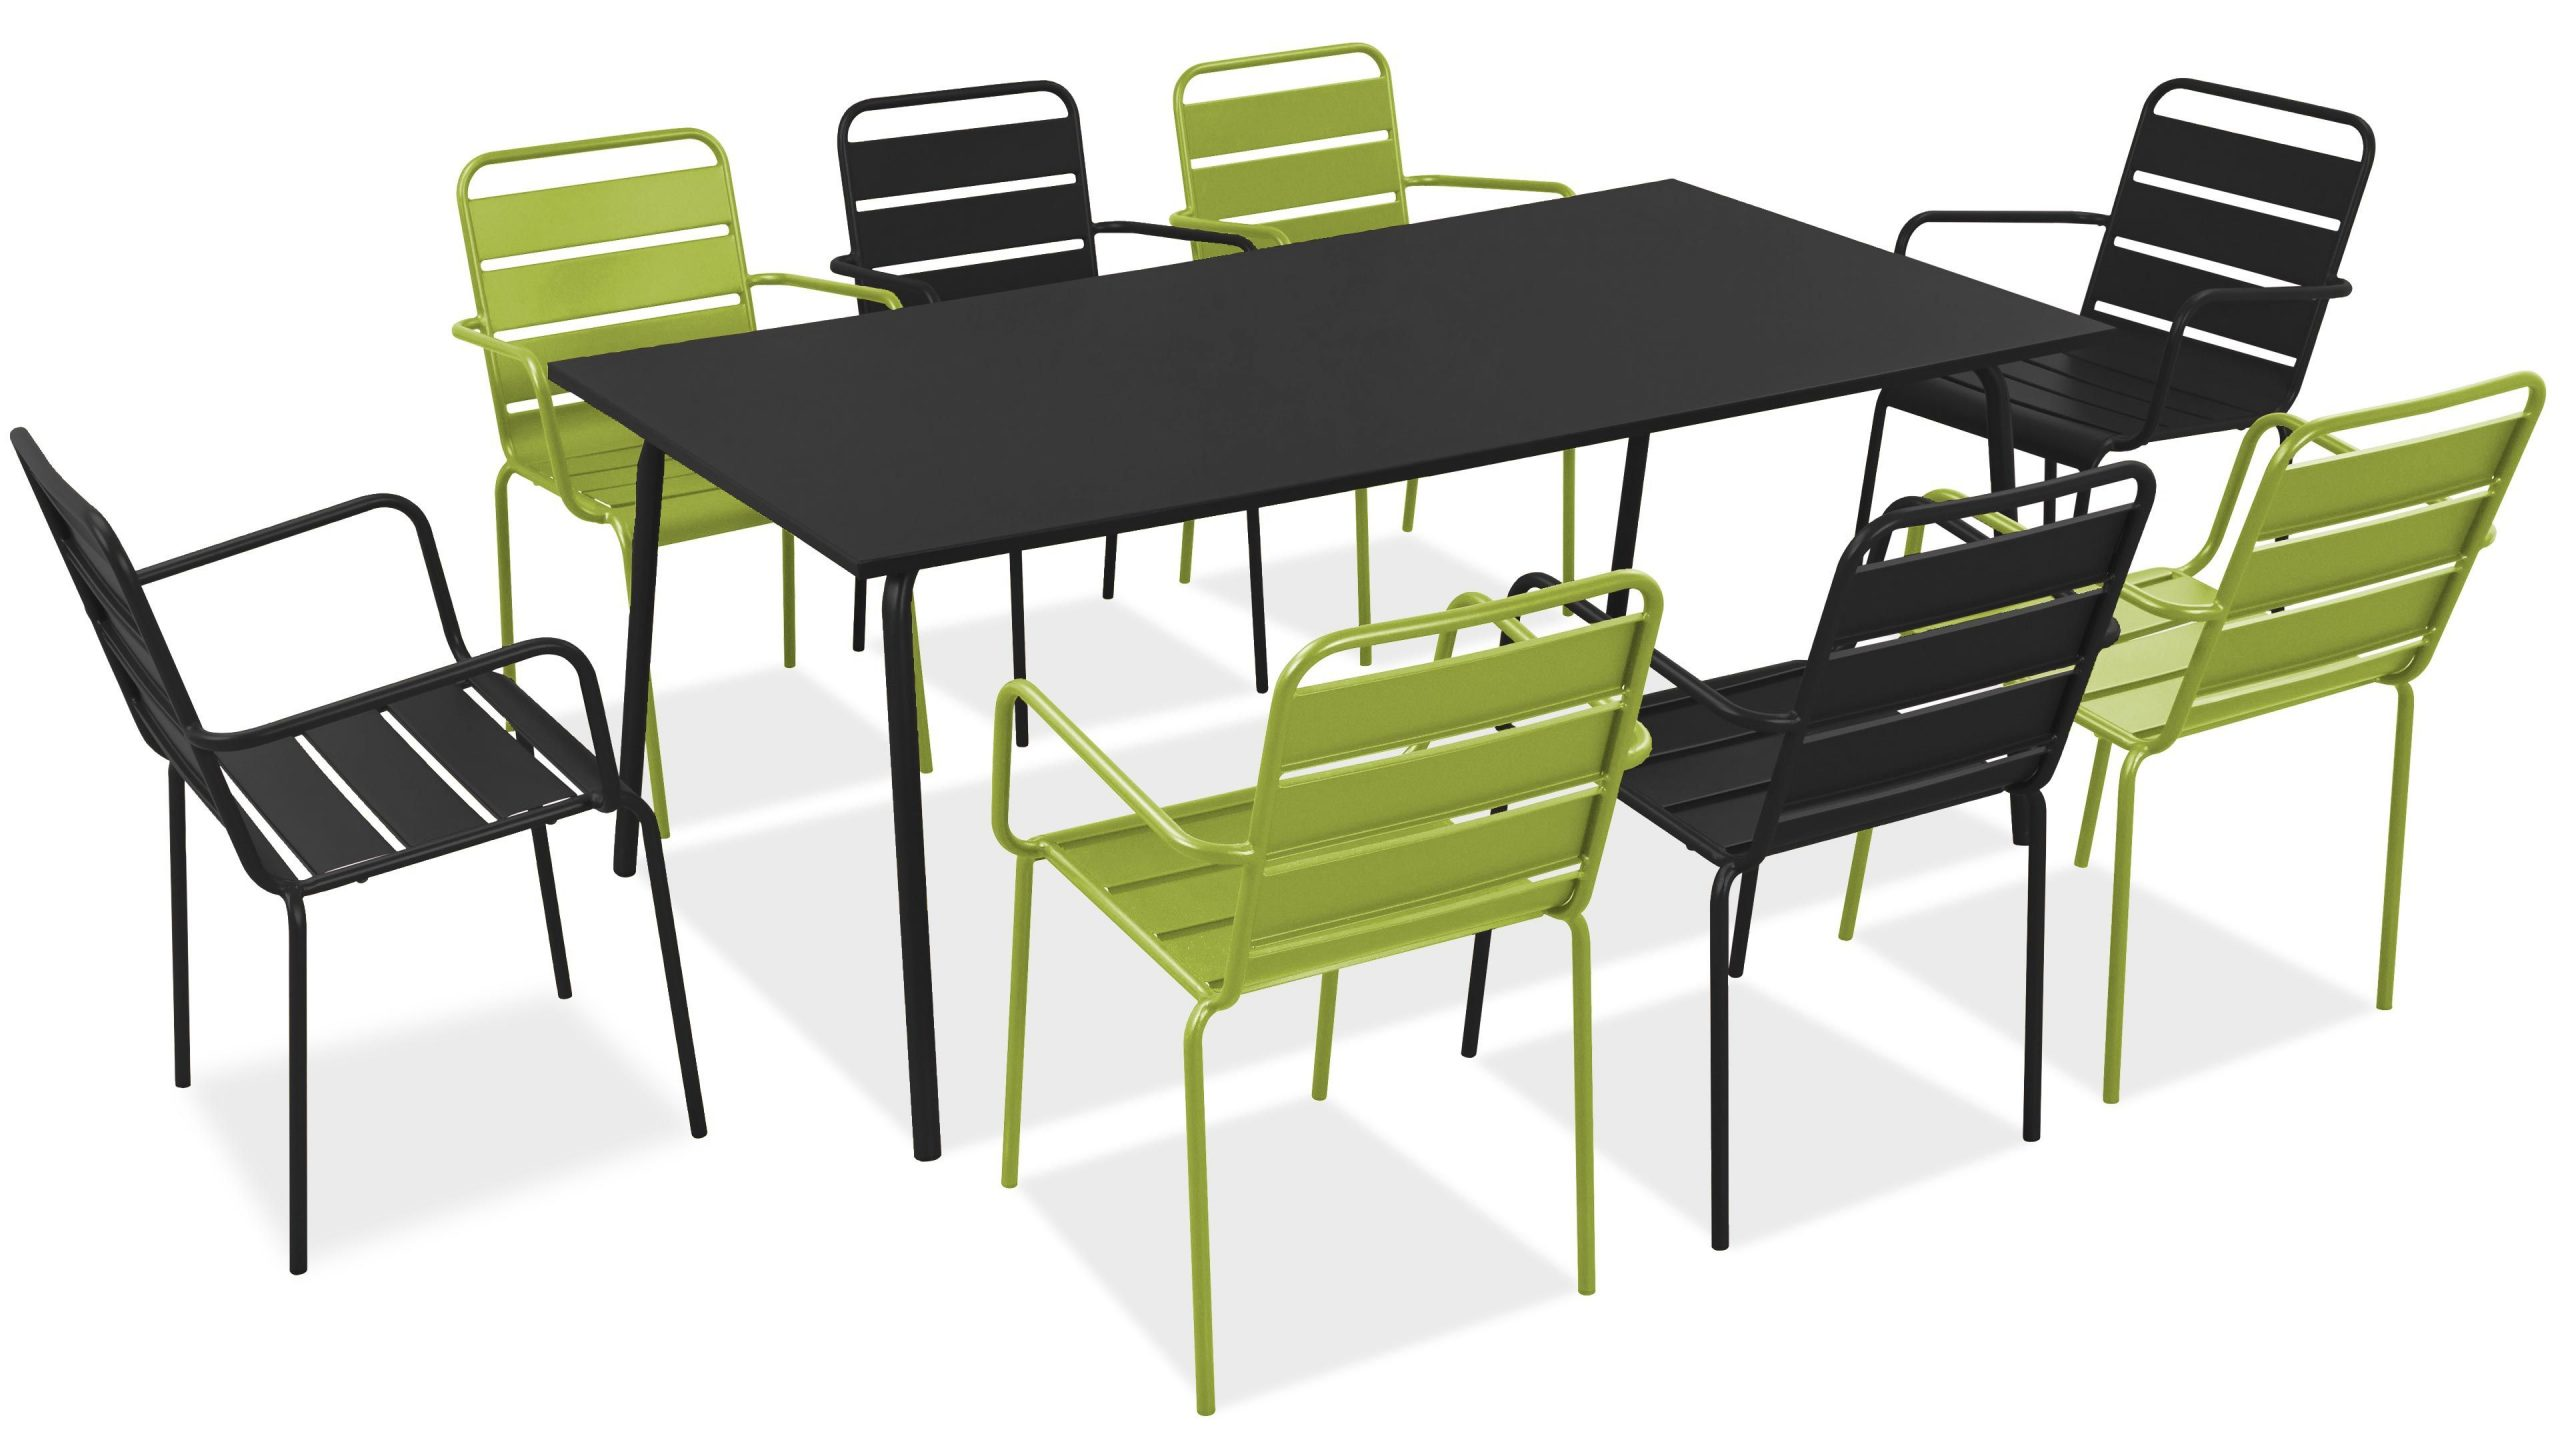 Salon De Jardin Metal Table Et Fauteuils destiné Table De Jardin En Solde